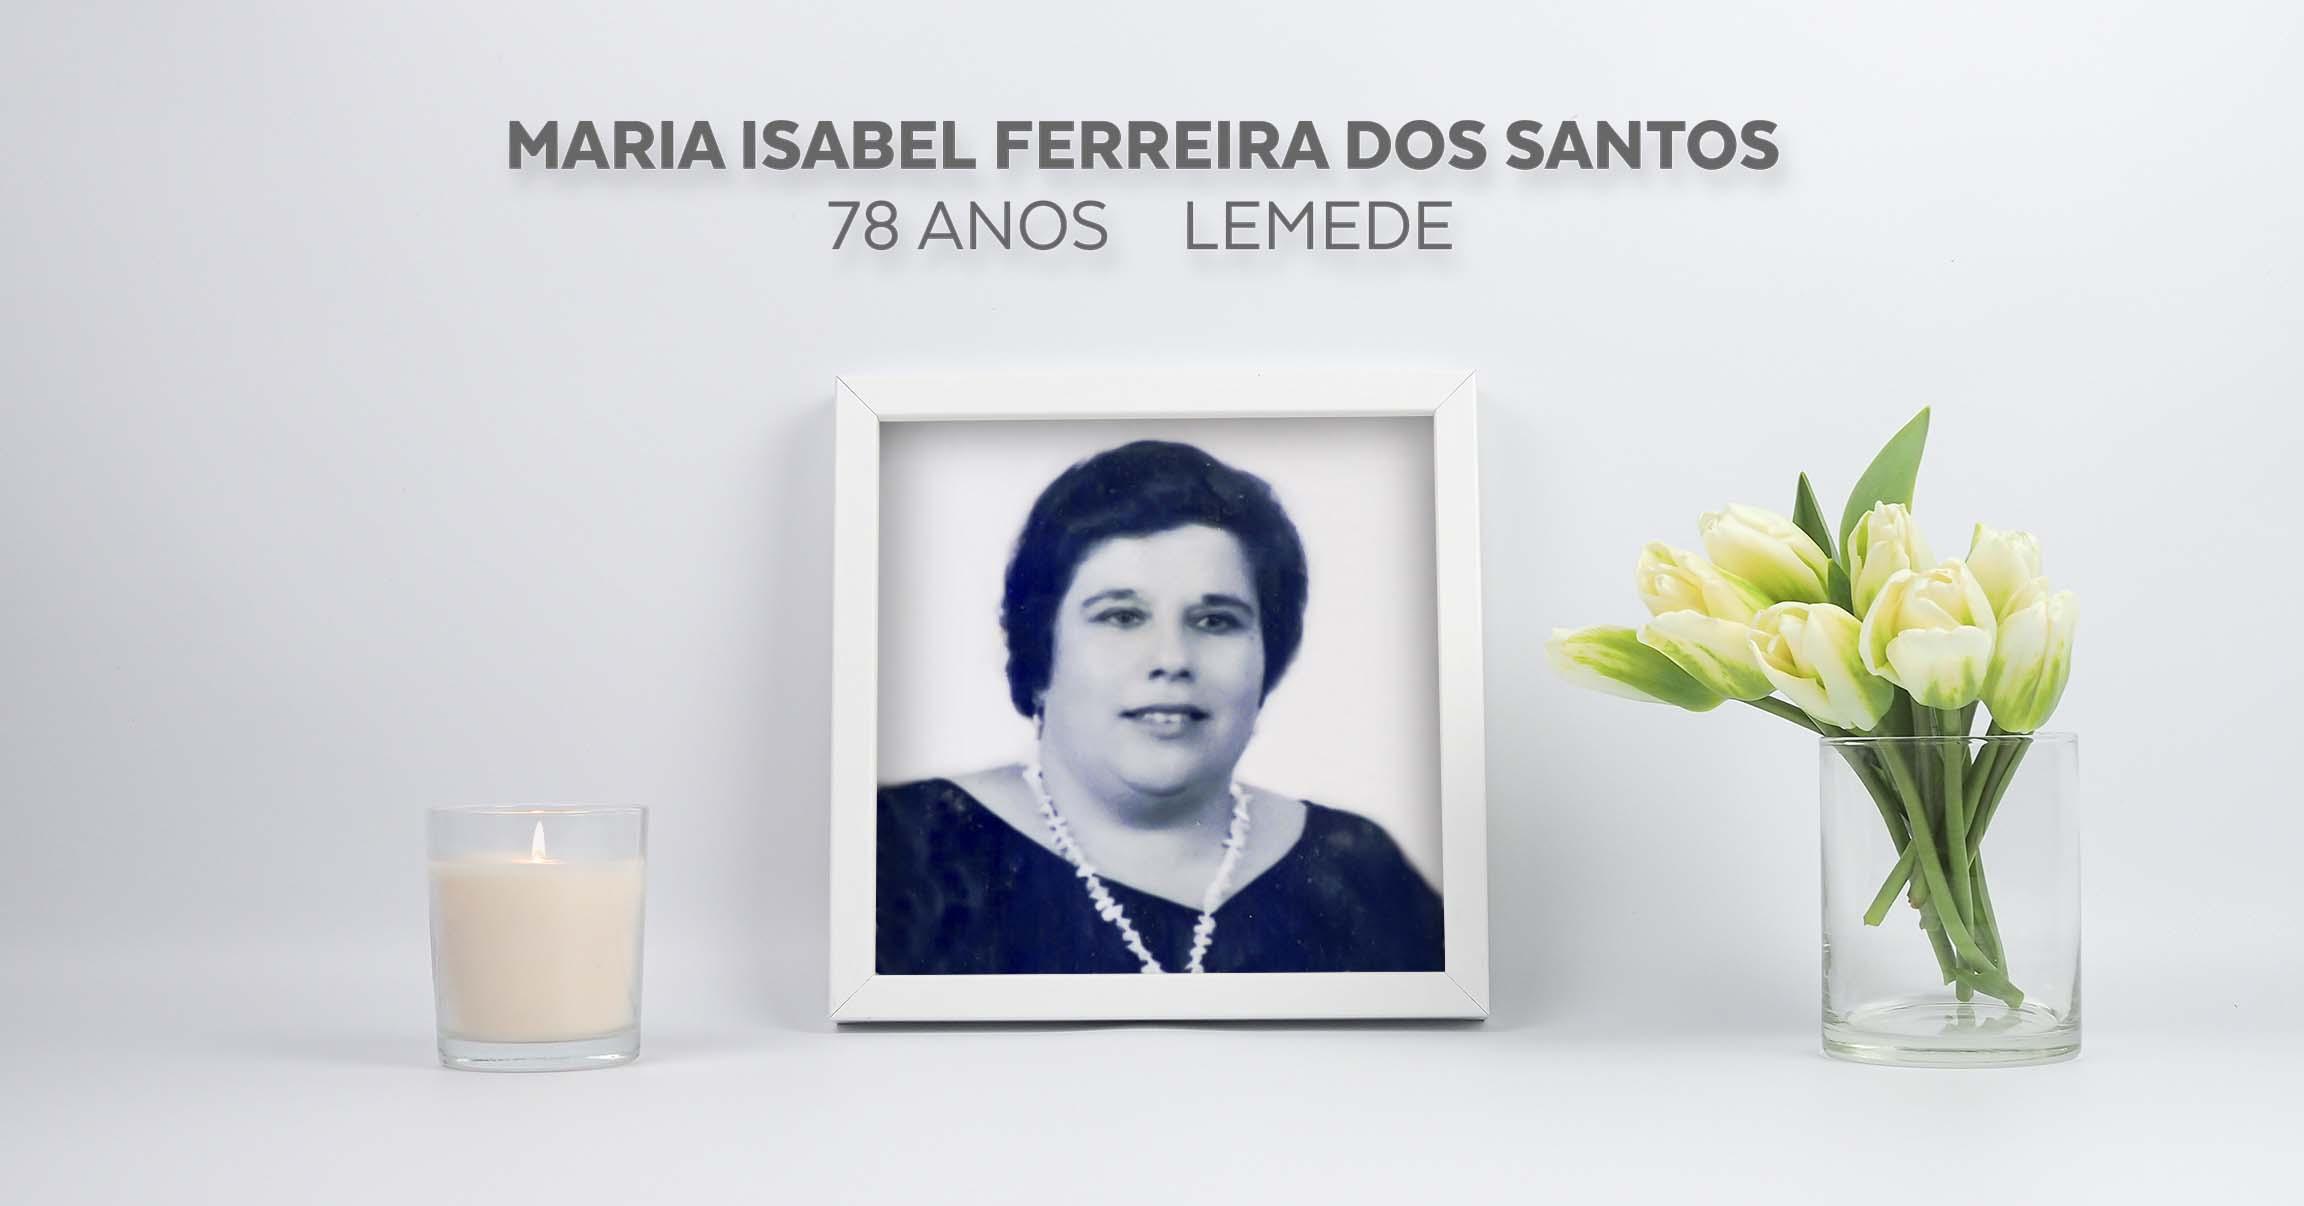 Maria Isabel Ferreira dos Santos